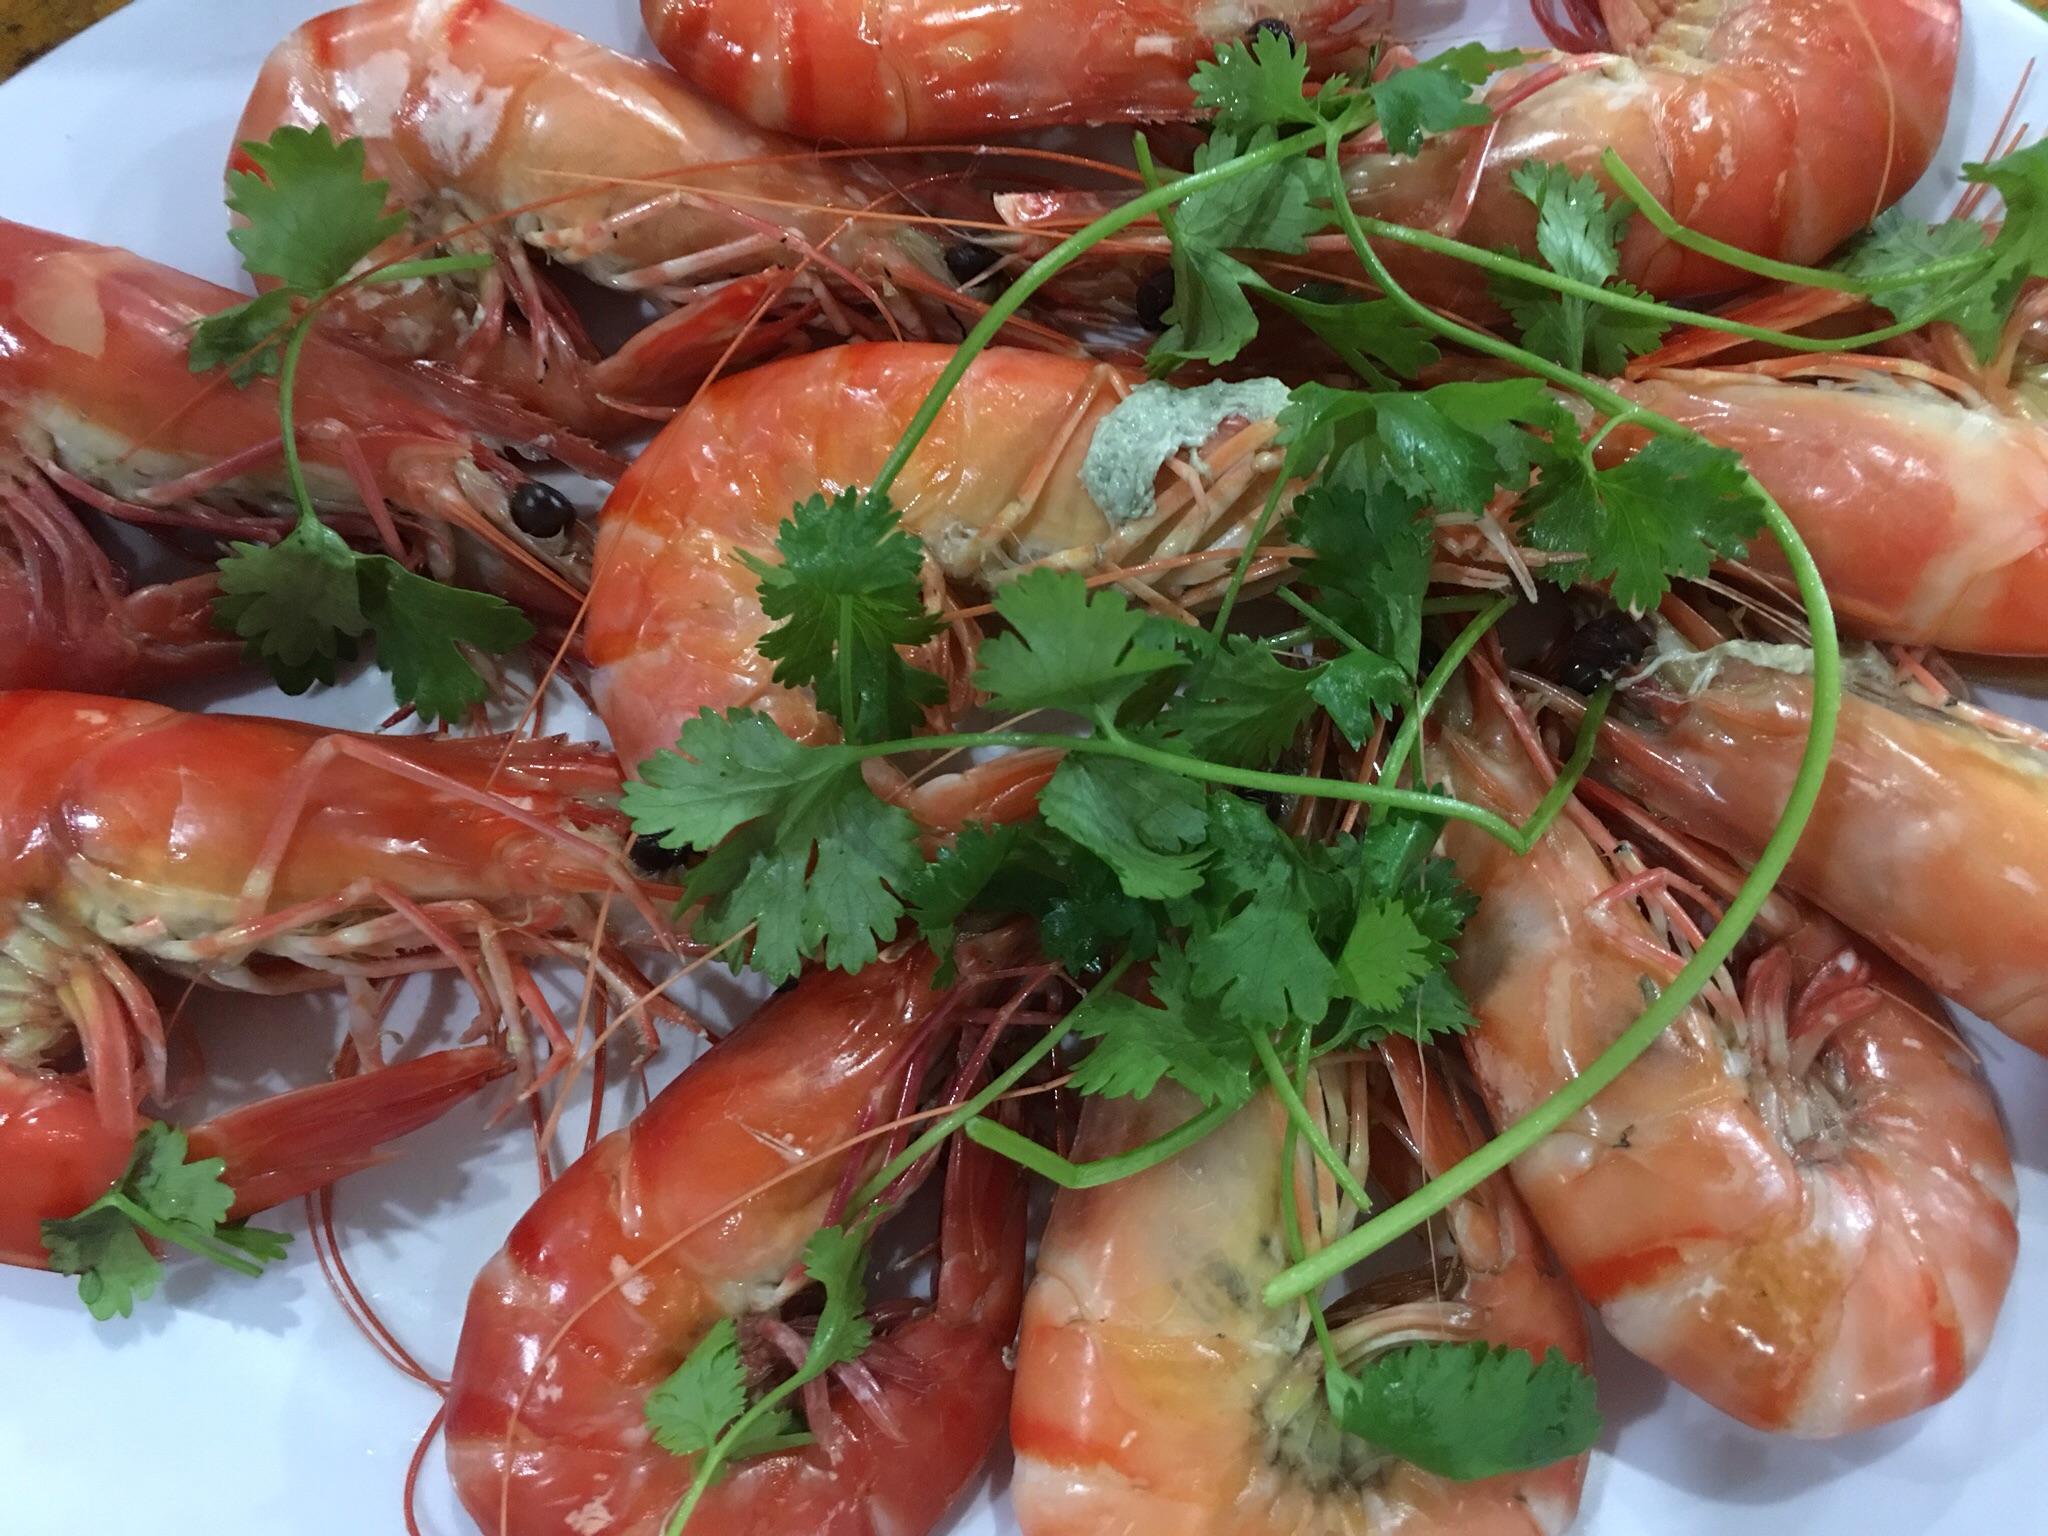 We enjoyed the very fresh and sweet tasting local shrimp...